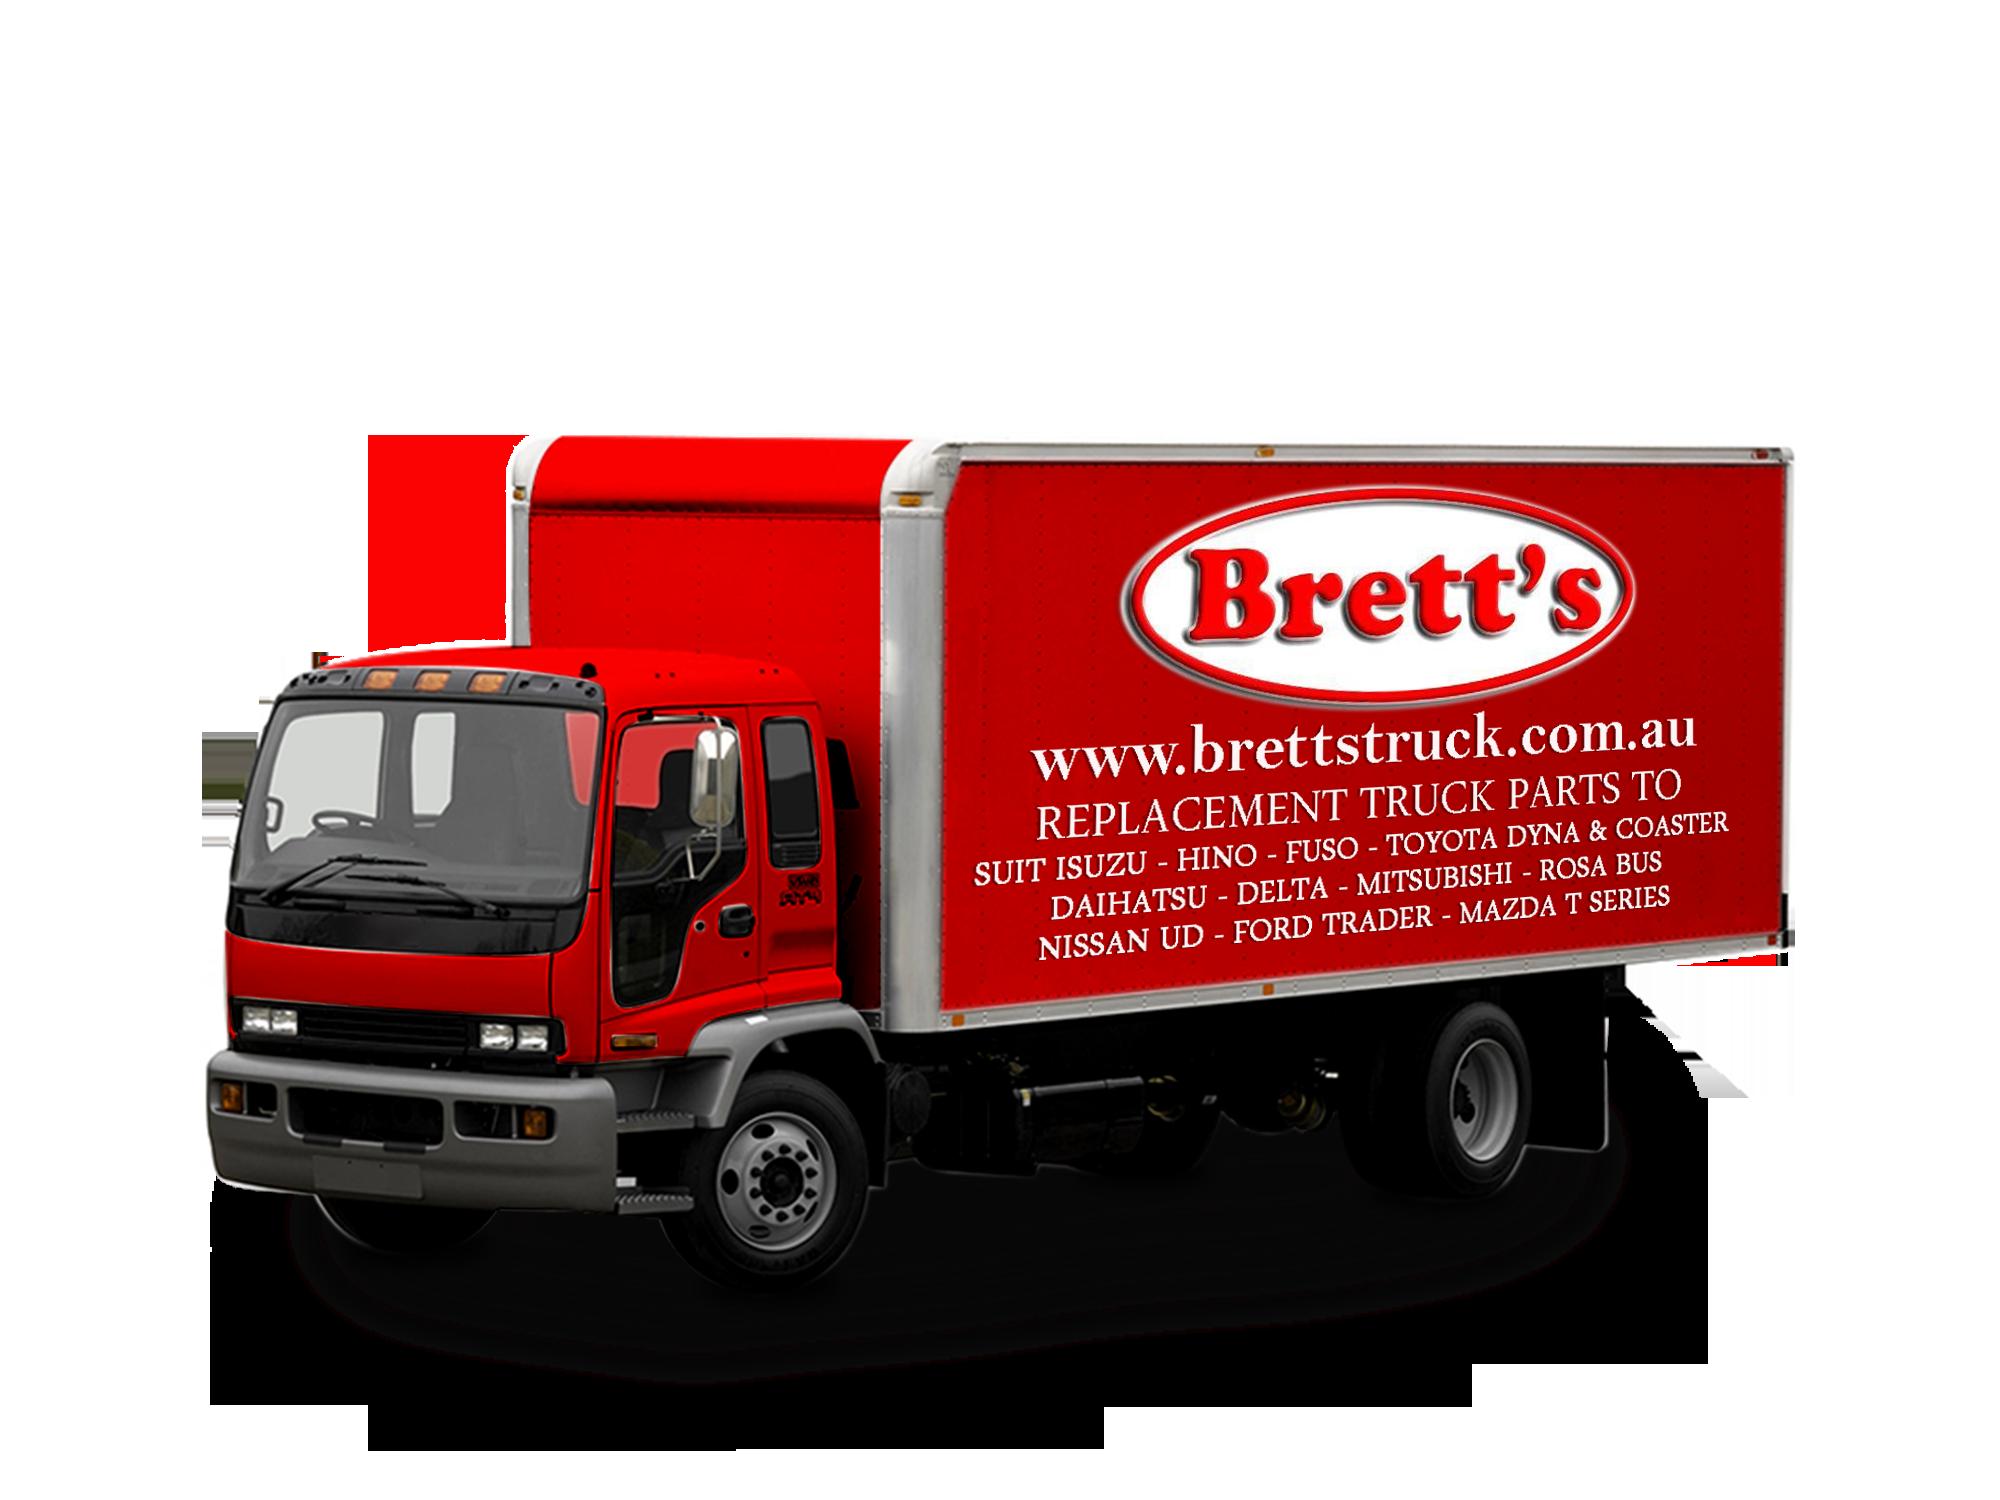 Contact Us - Truck Parts and All Filters Hino Isuzu Fuso Mitsubishi ...